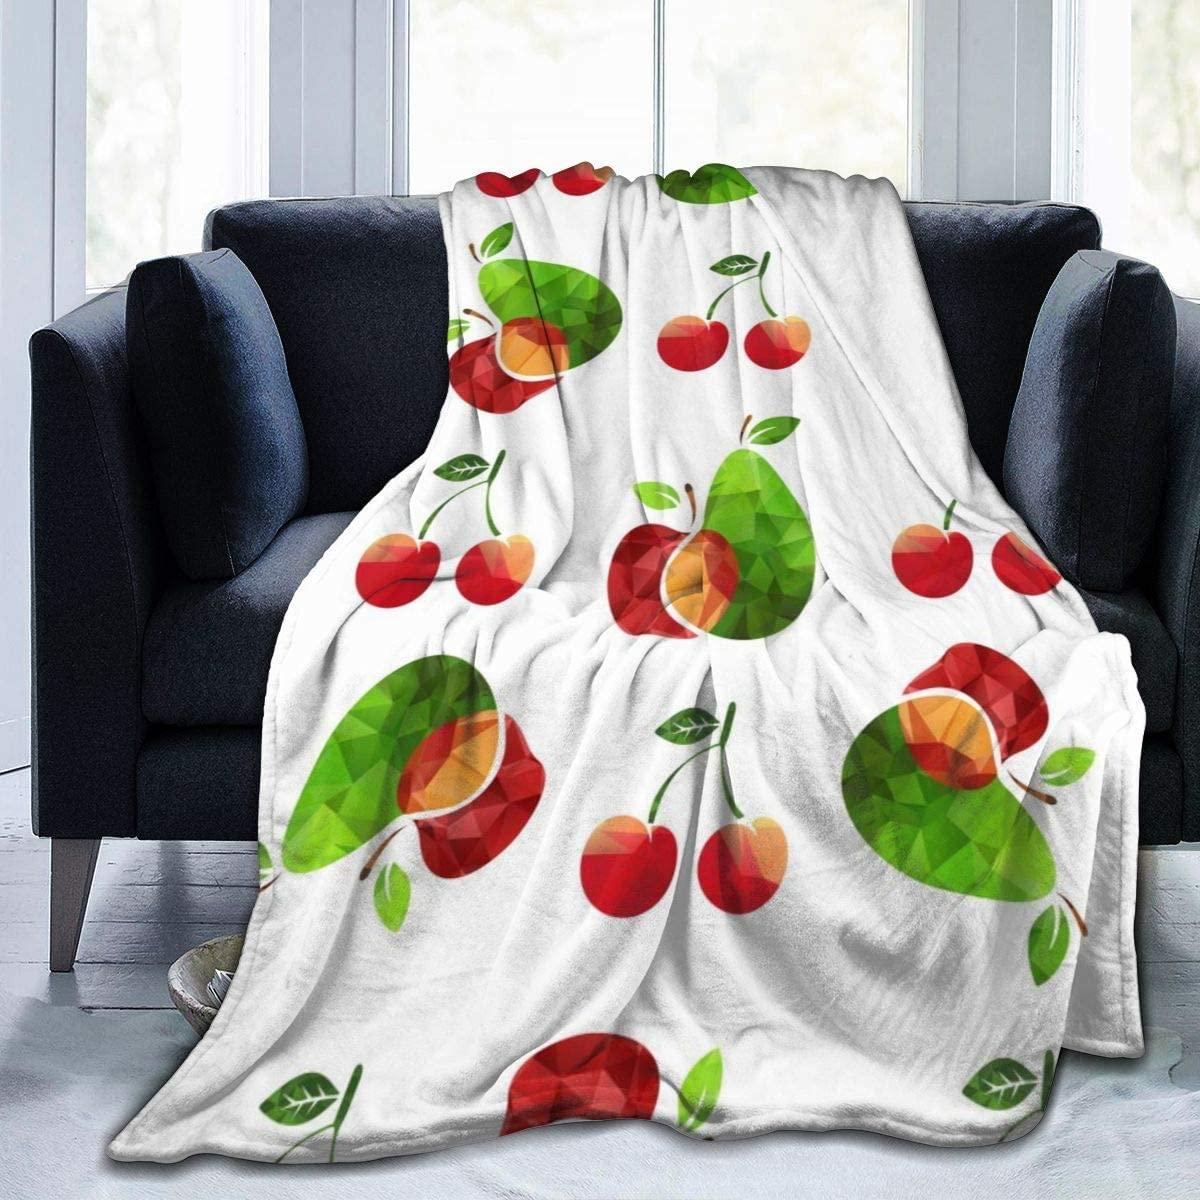 Micro Fleece Plush Soft Baby Blanket Beautiful Cute Cherry Pear Watercolor Fruit Fluffy Warm Toddler Bed/Crib Blanket Lightweight Flannel Daycare Nap Kids Sleeping Tummy Time Throw Blanket Girls Boy K